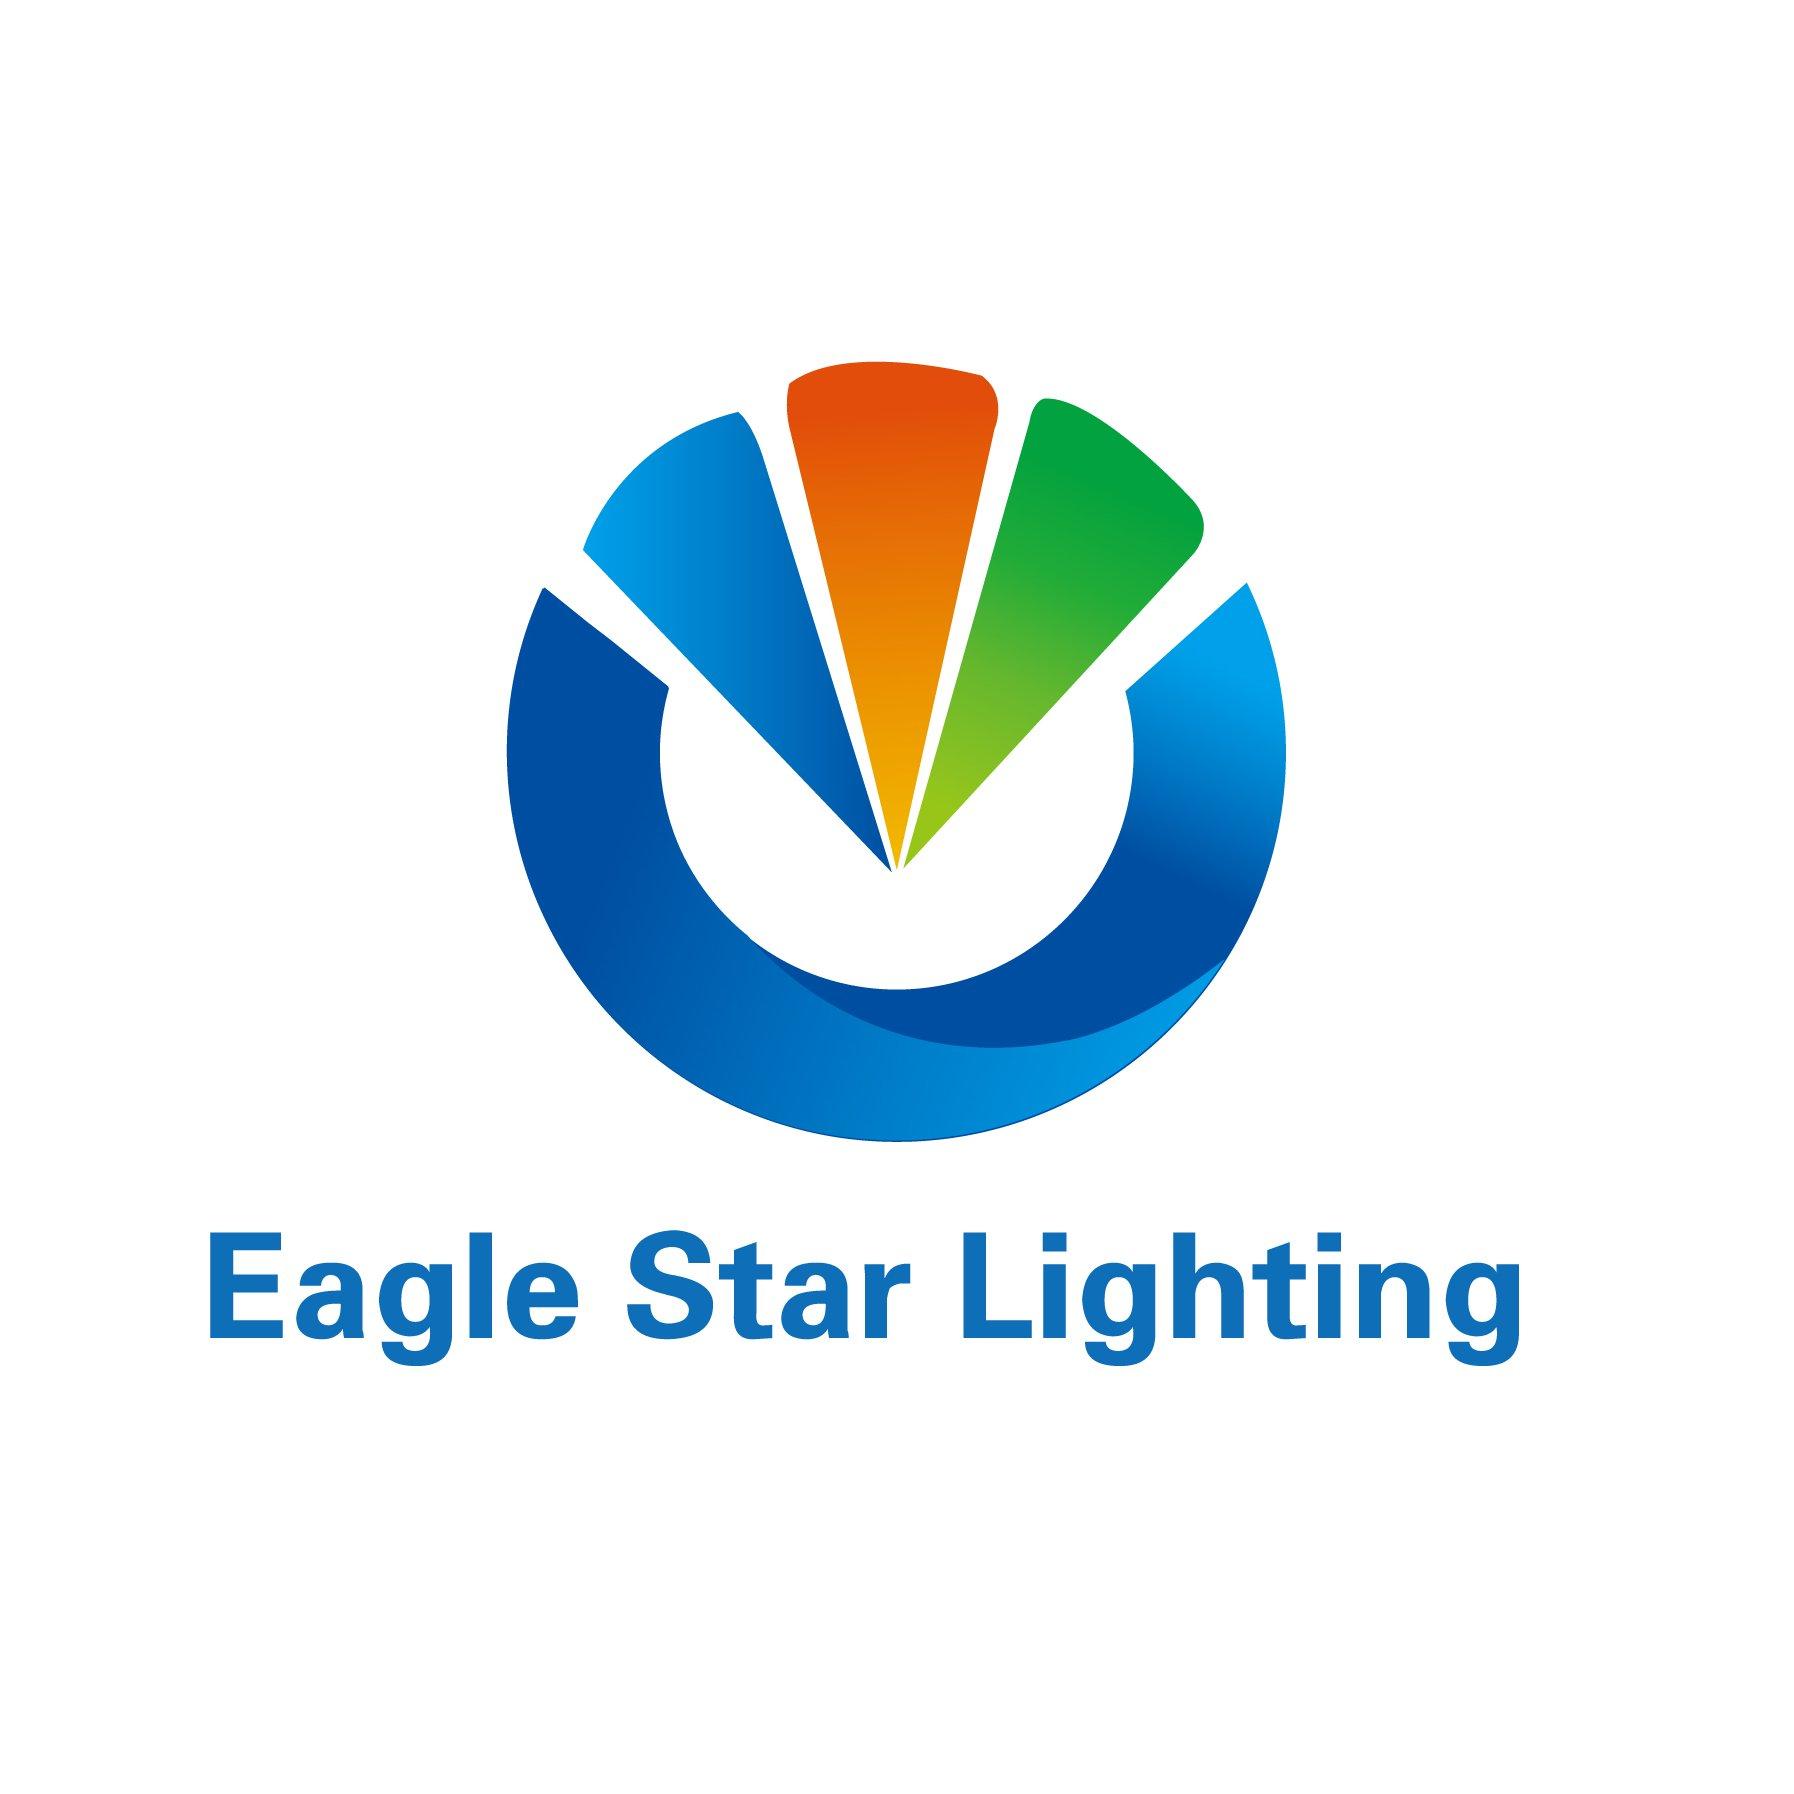 Eagle star lighting eslbarry01 twitter biocorpaavc